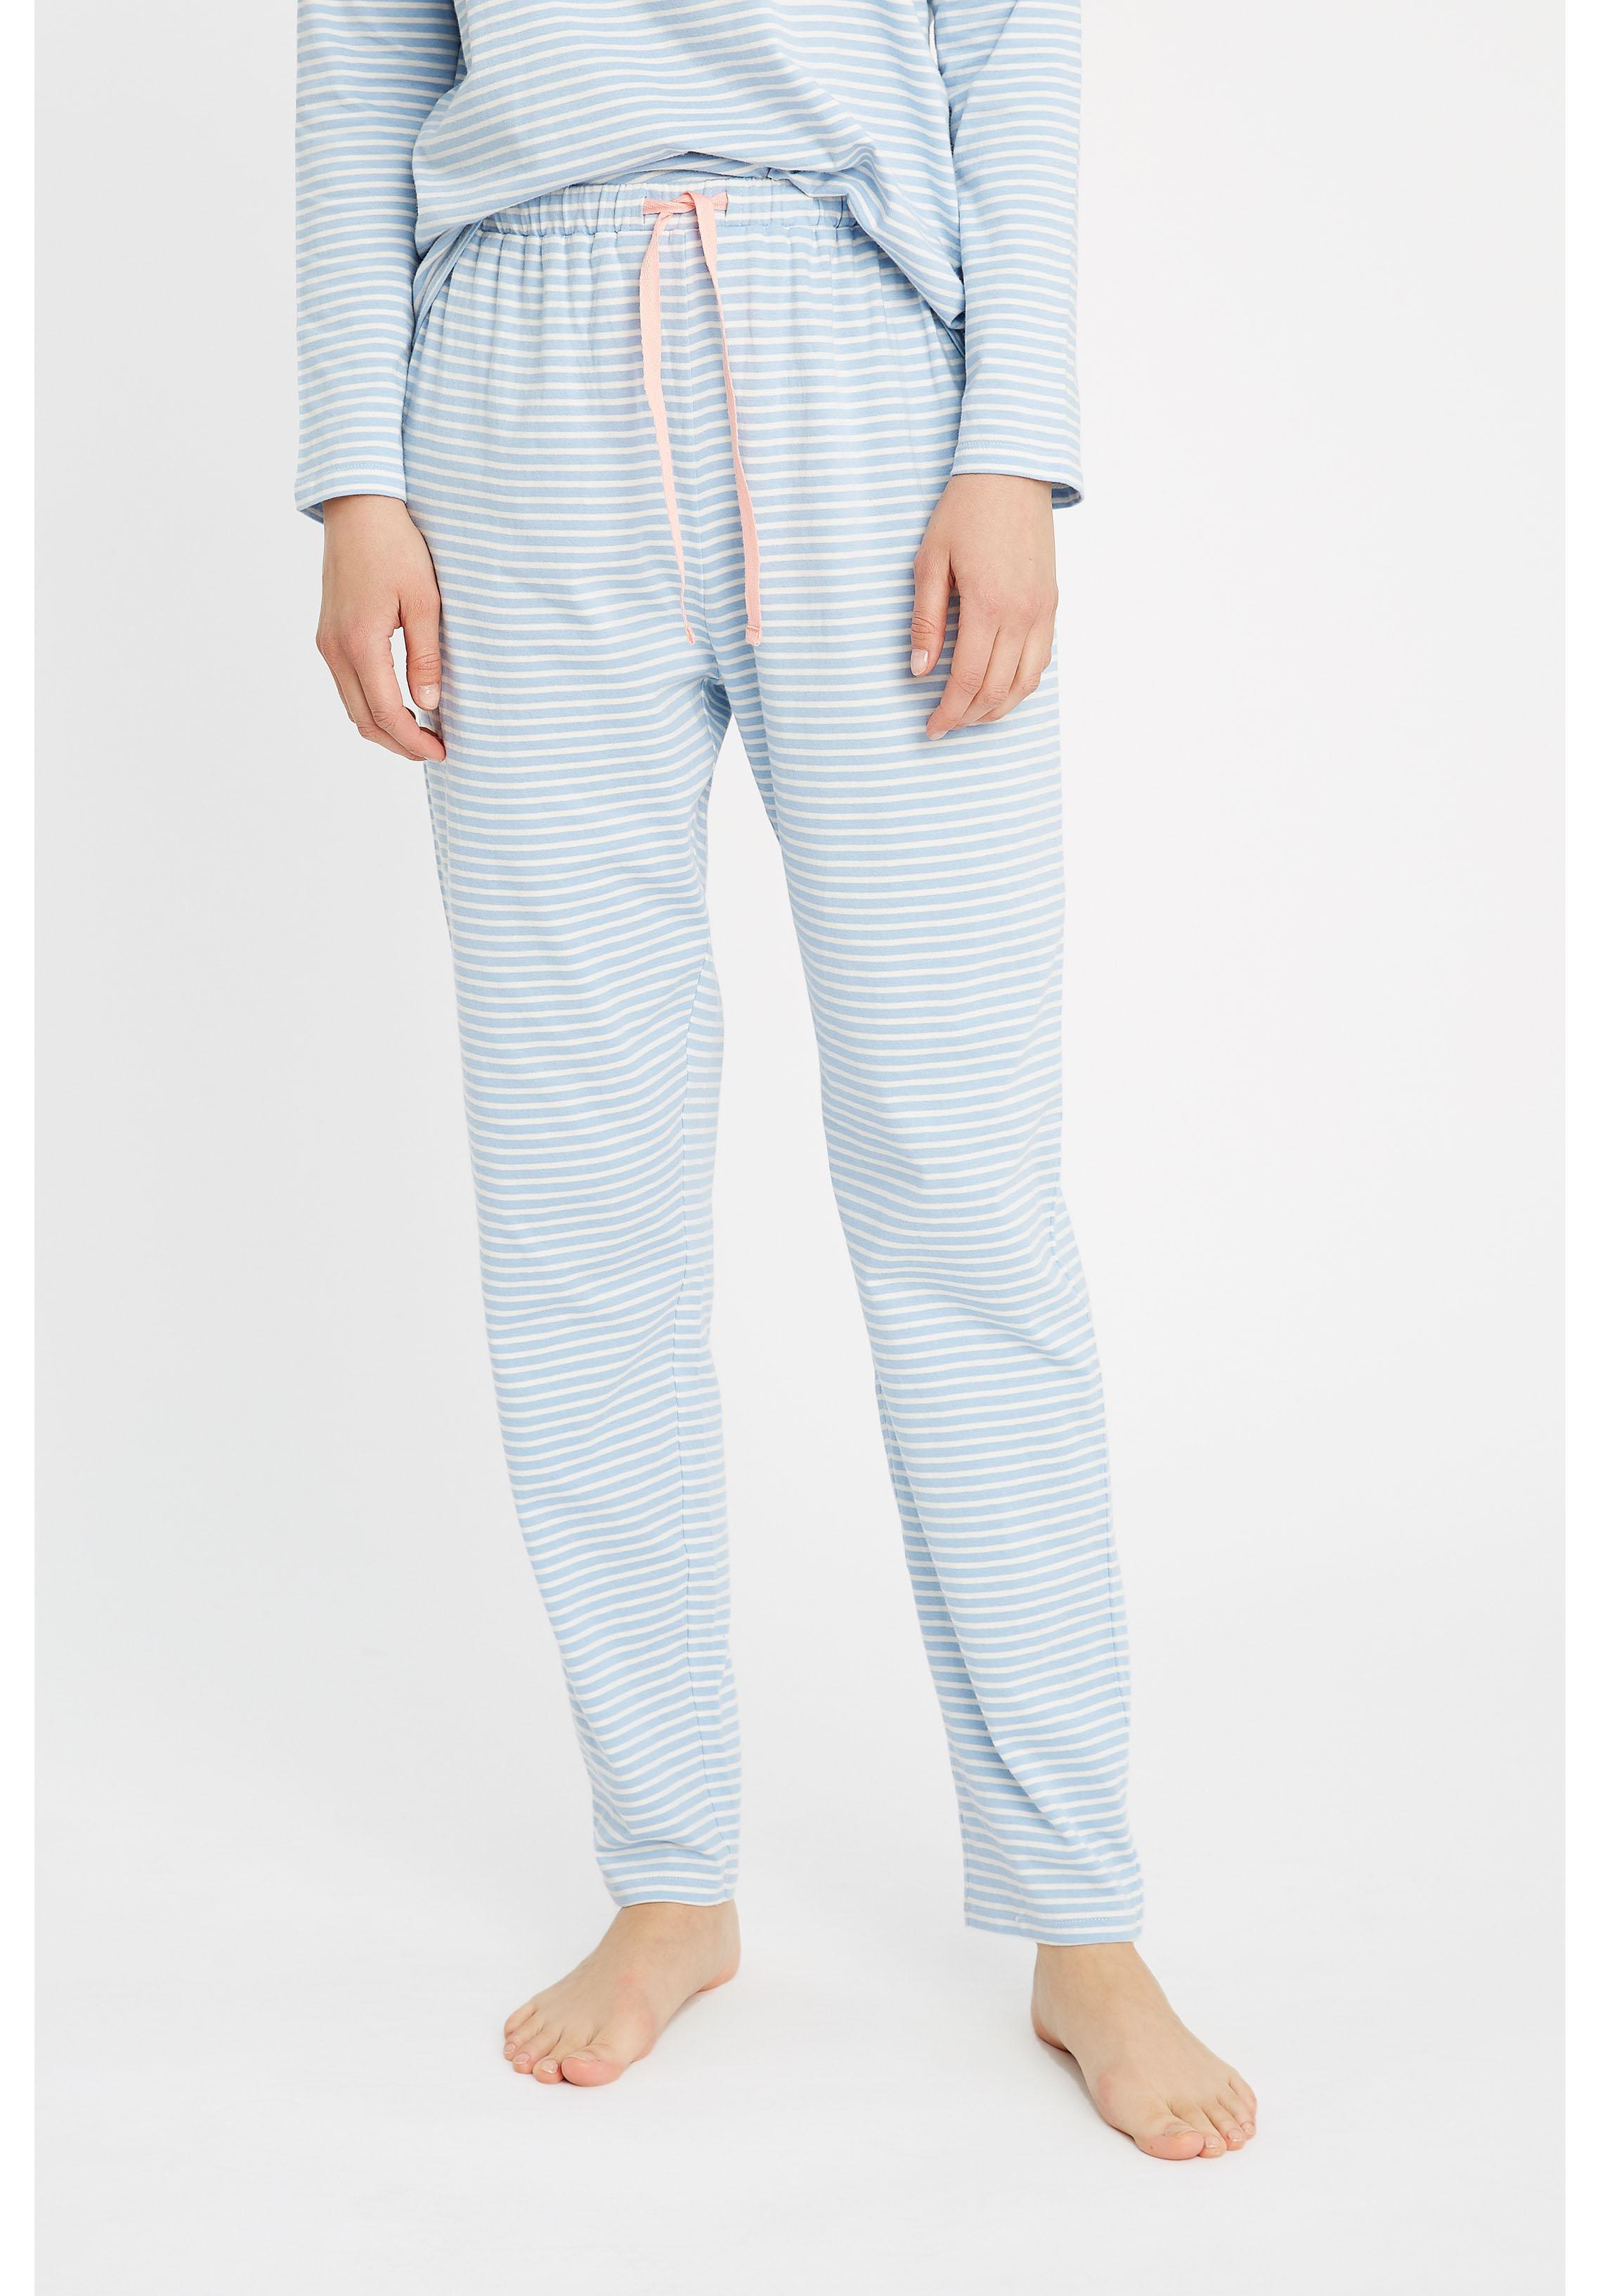 Peopletree Womens Stripe Pyjama Trousers Bottoms